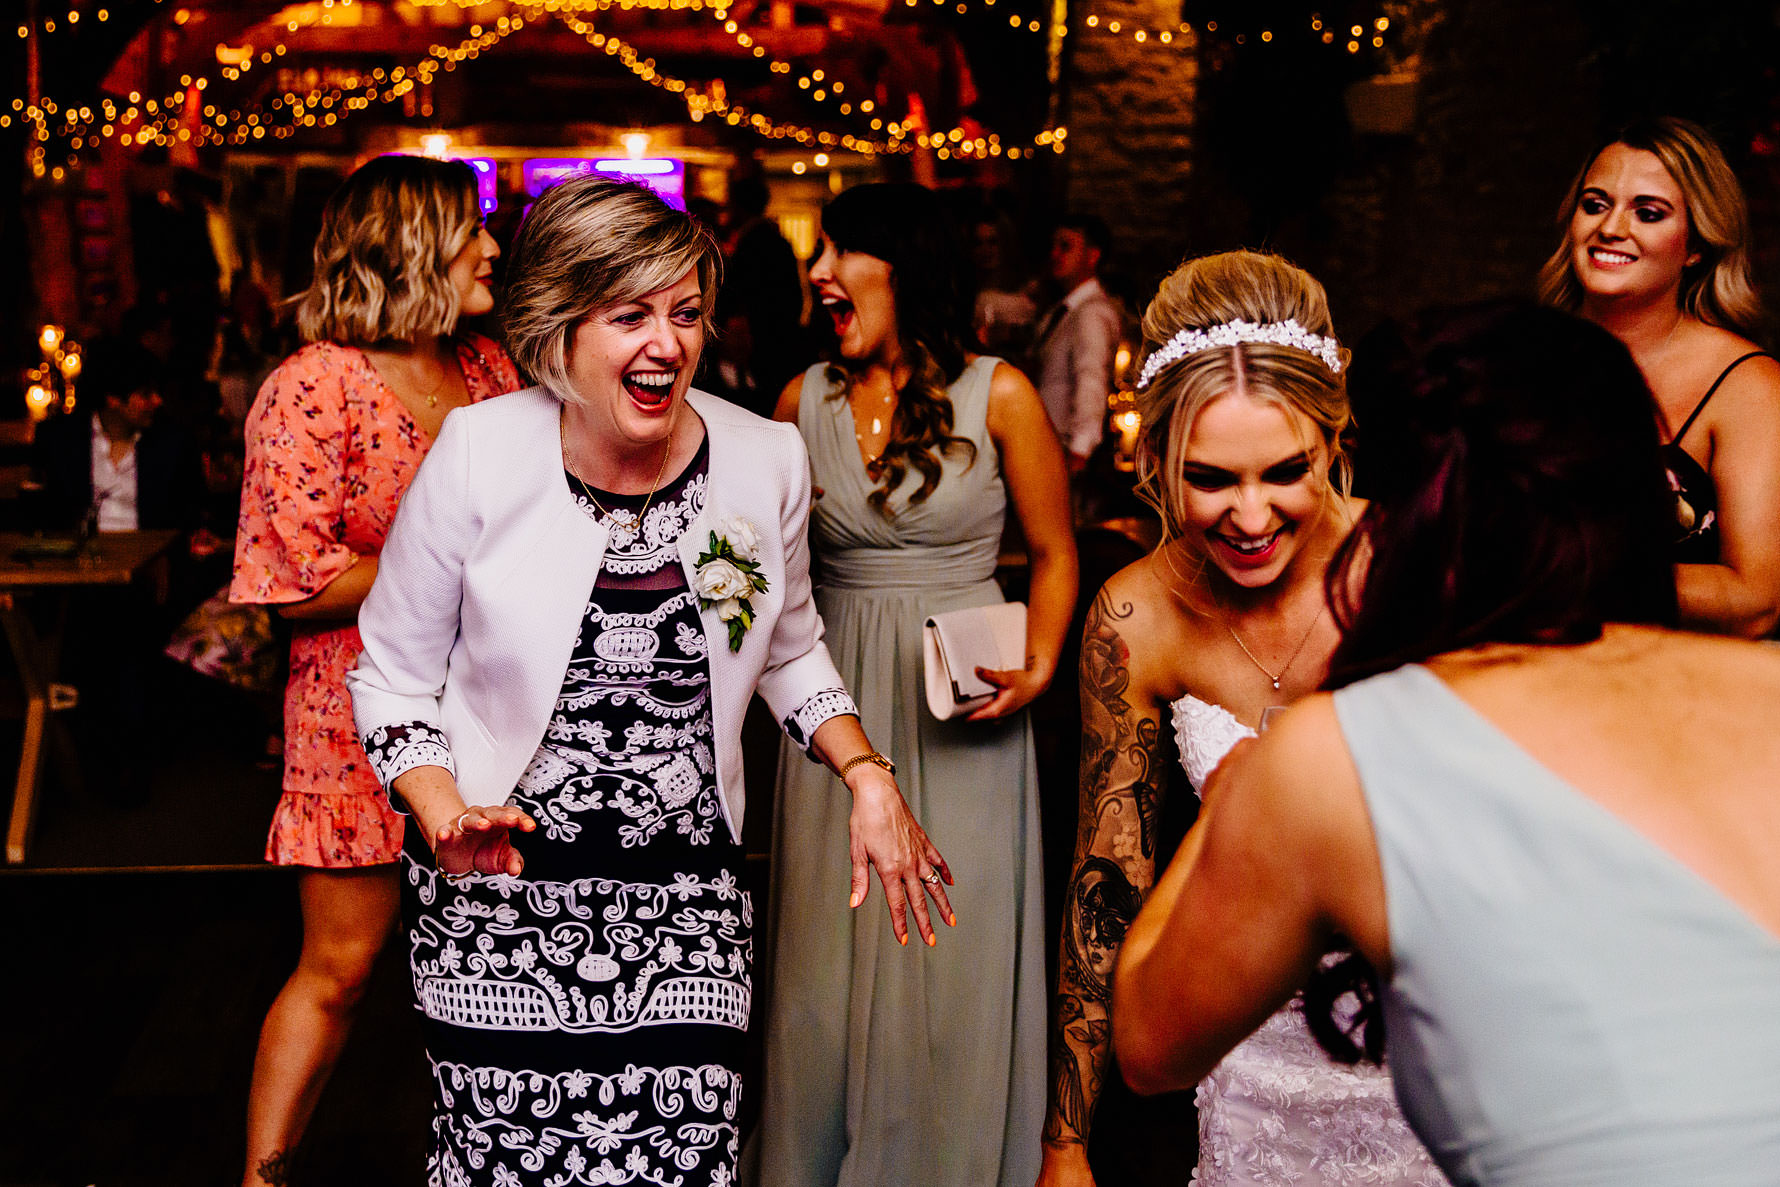 lots of wedding fun